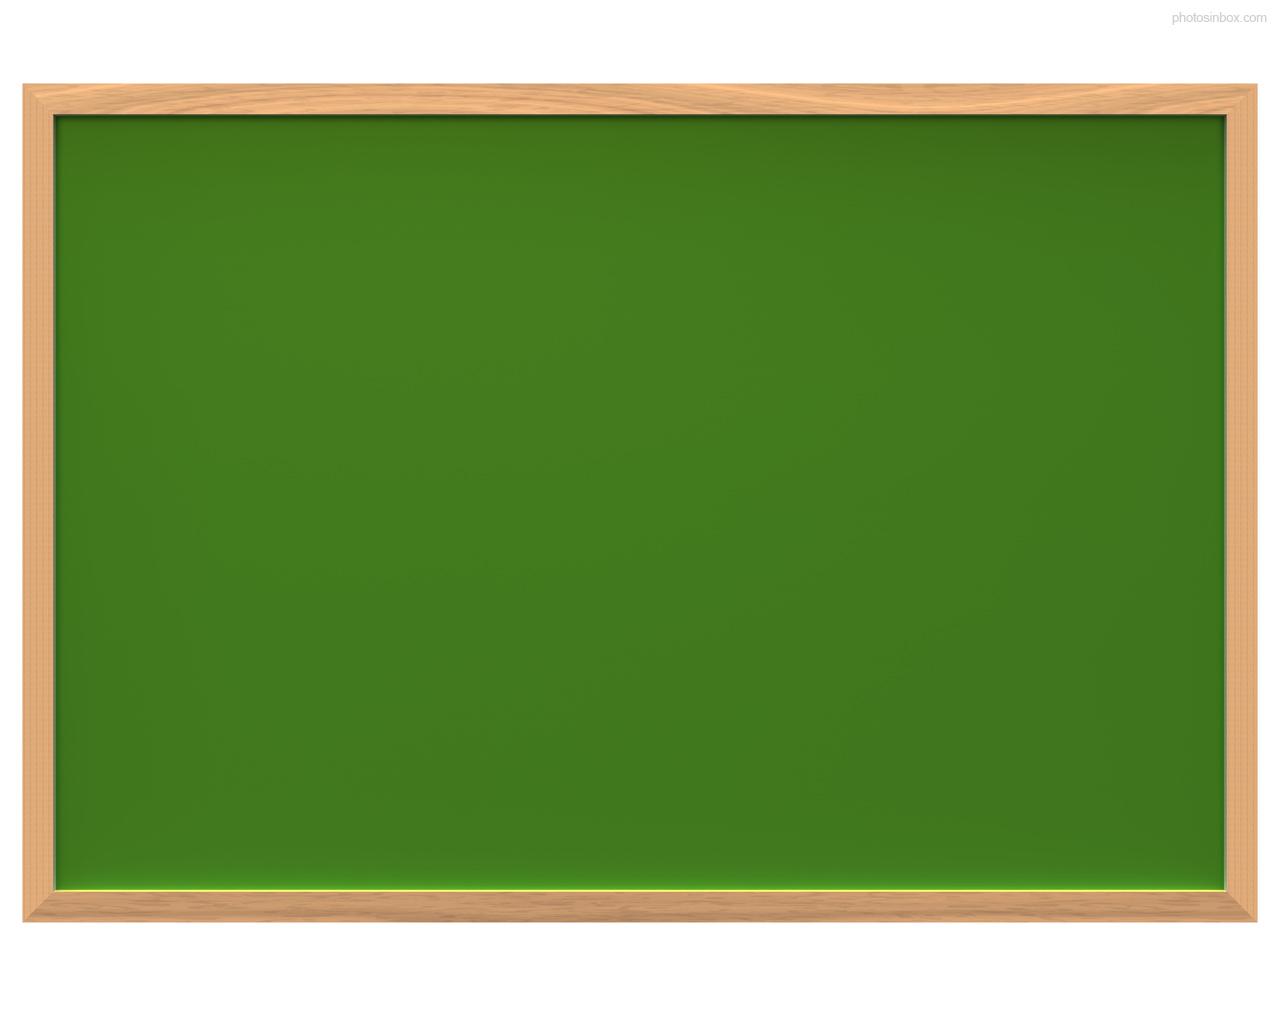 Blackboard Frame Backgrounds